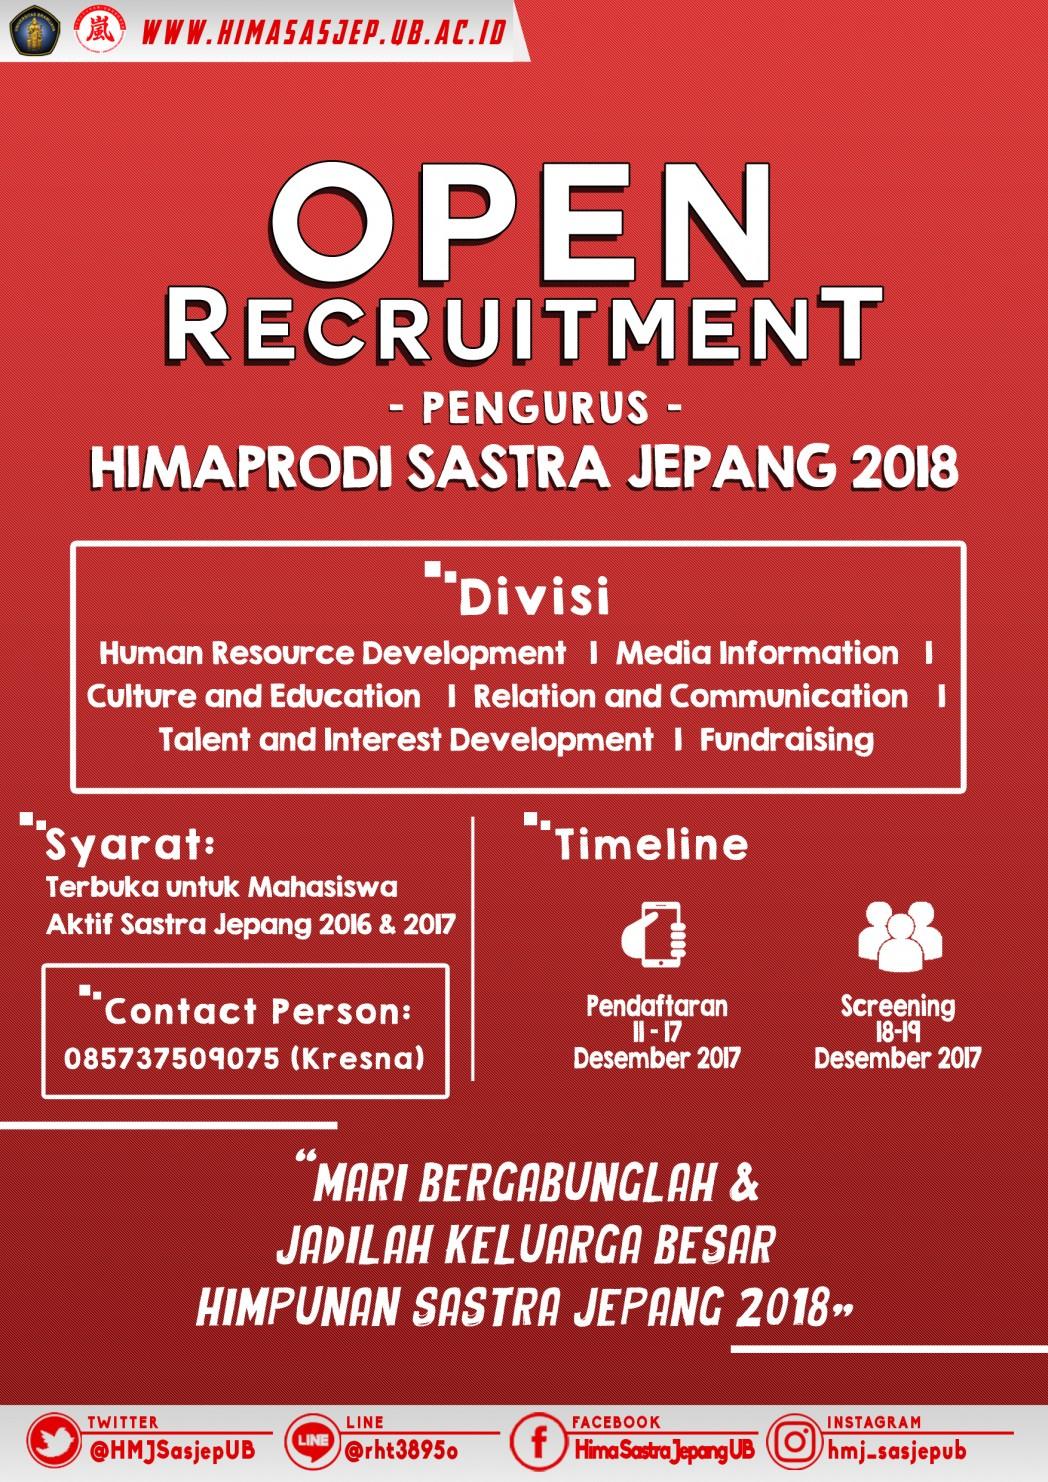 Open Recruitment staff Himaprodi Sastra Jepang 2018